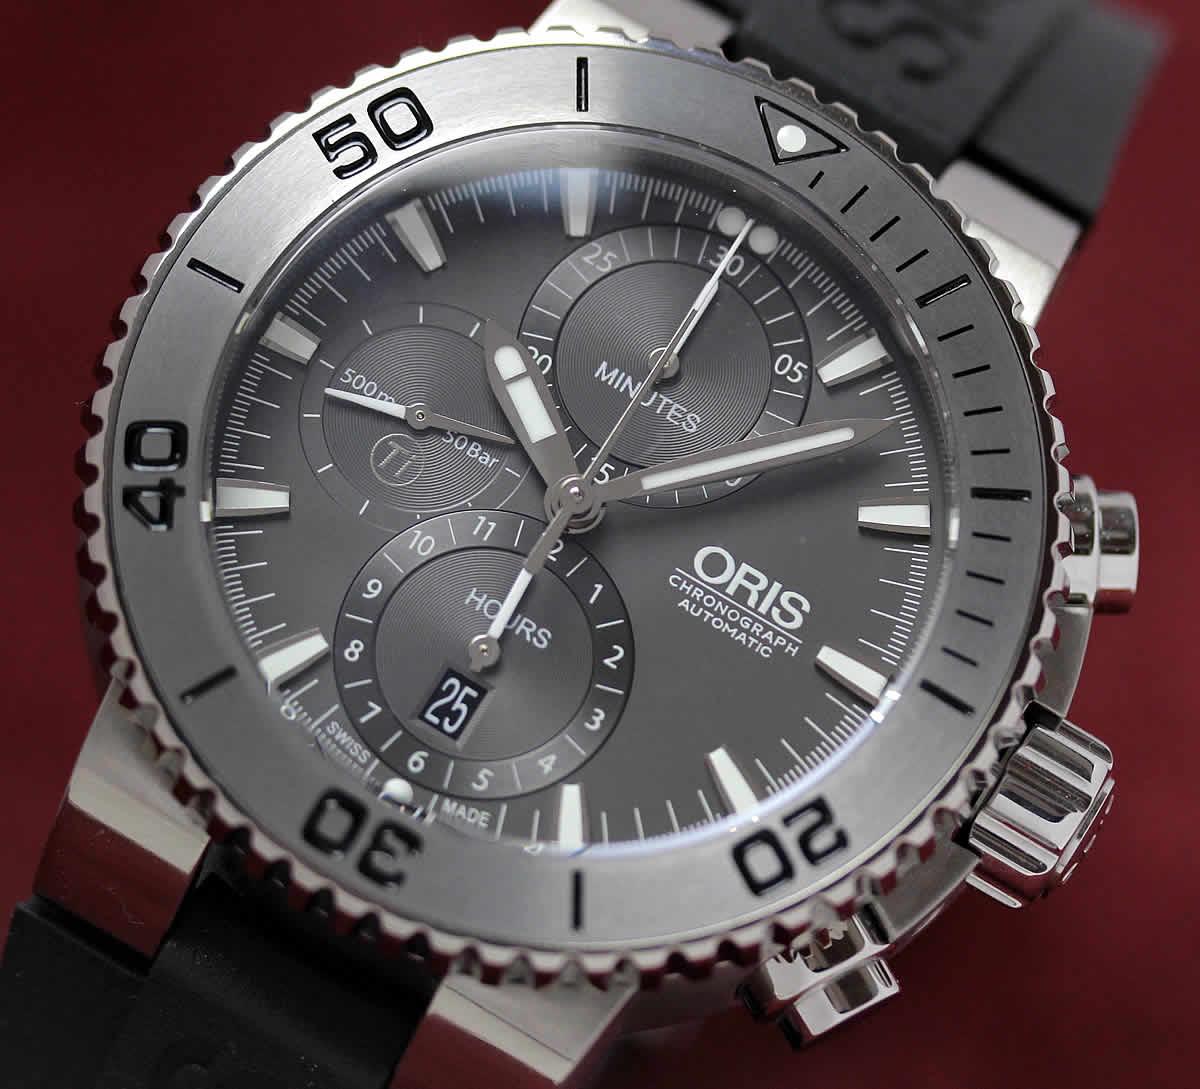 oris オリス ダイバー 腕時計